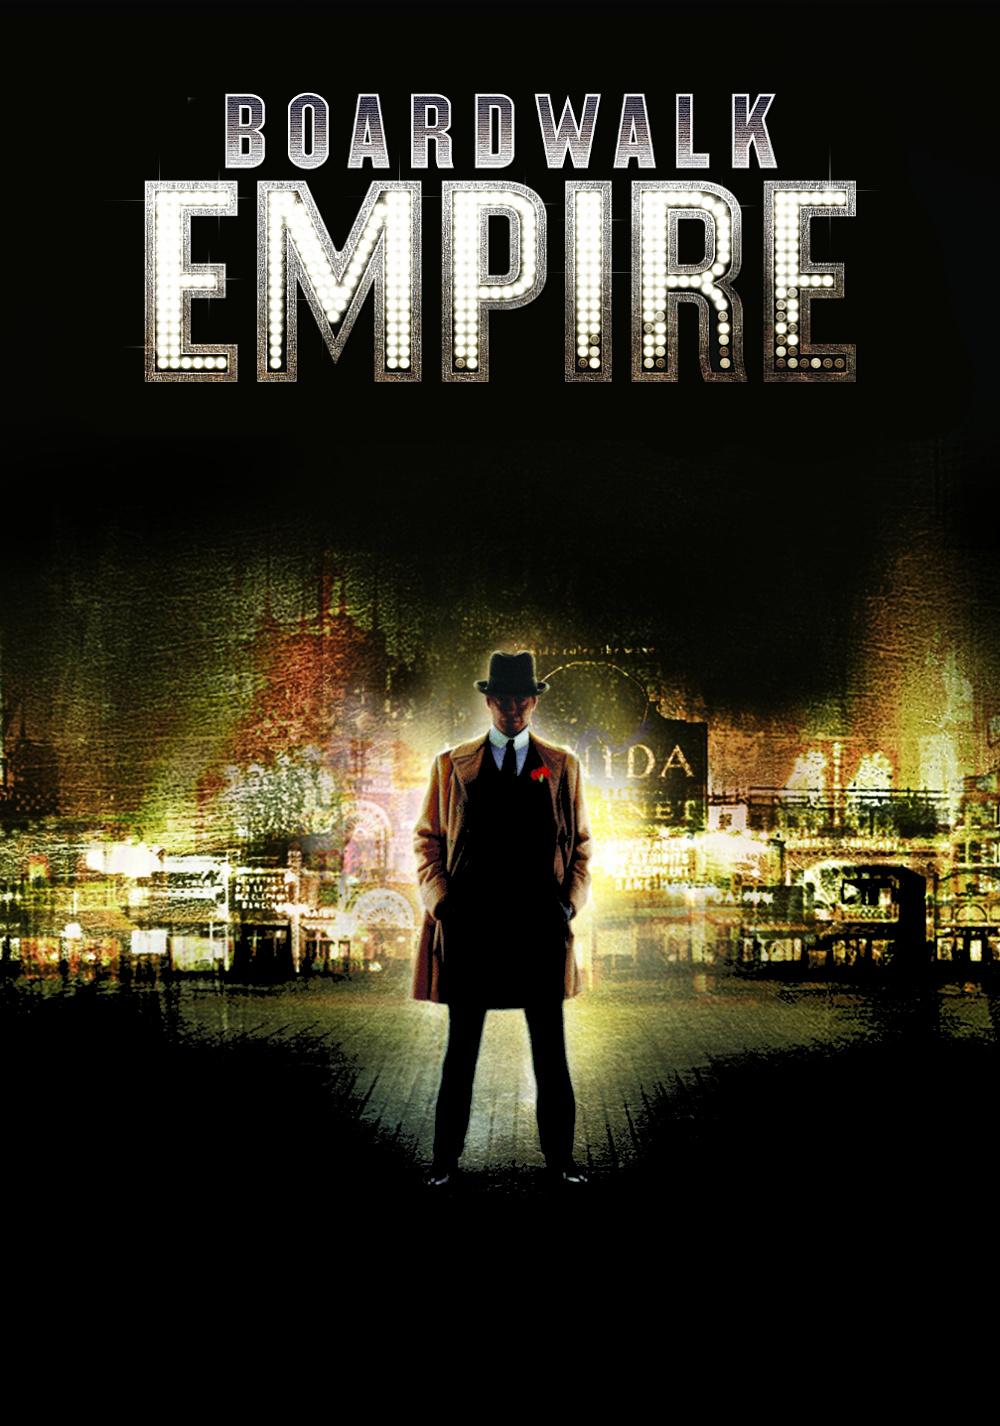 Boardwalk Empire   TV fanart   fanart.tv